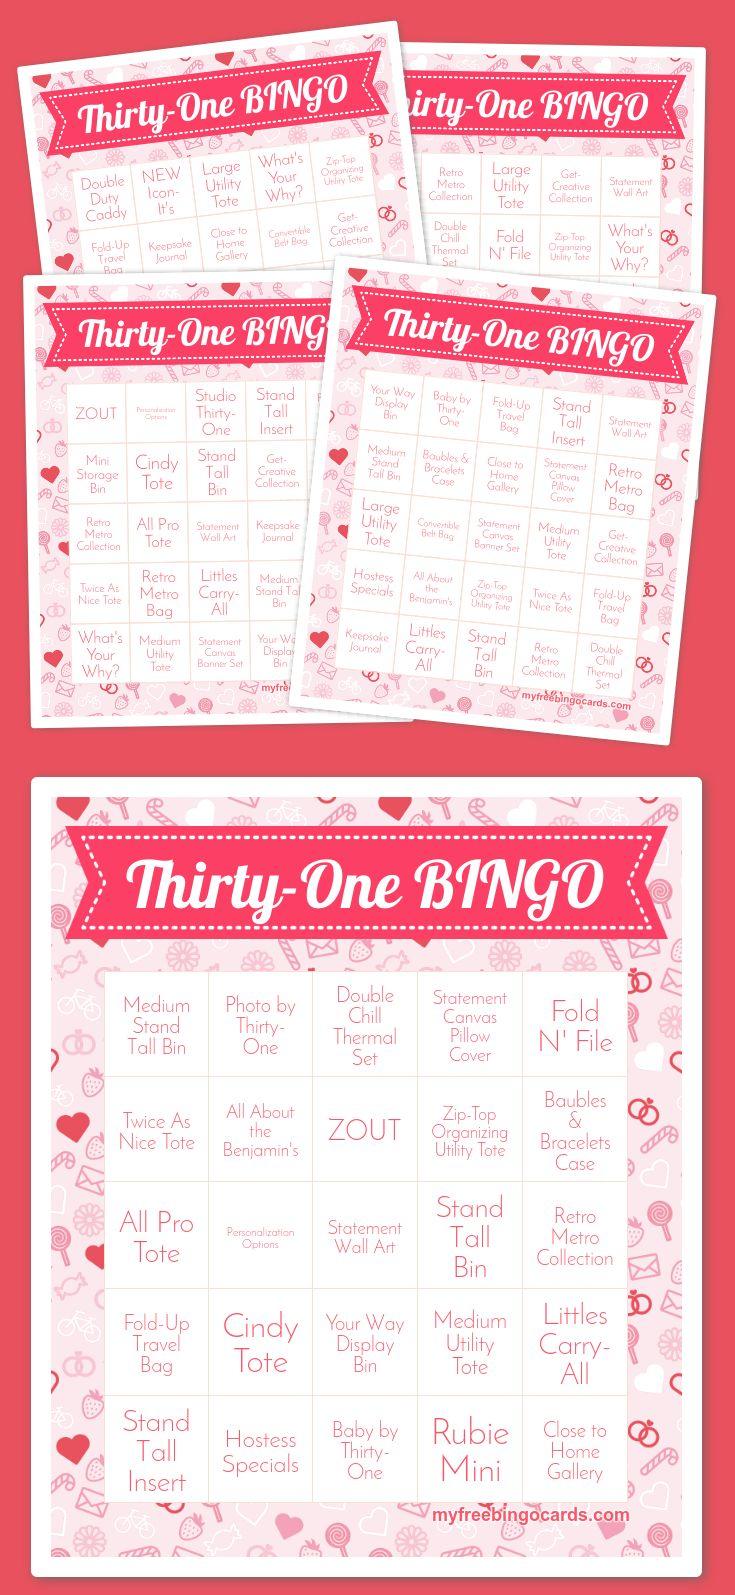 ThirtyOne BINGO Bingo card generator, Bingo printable